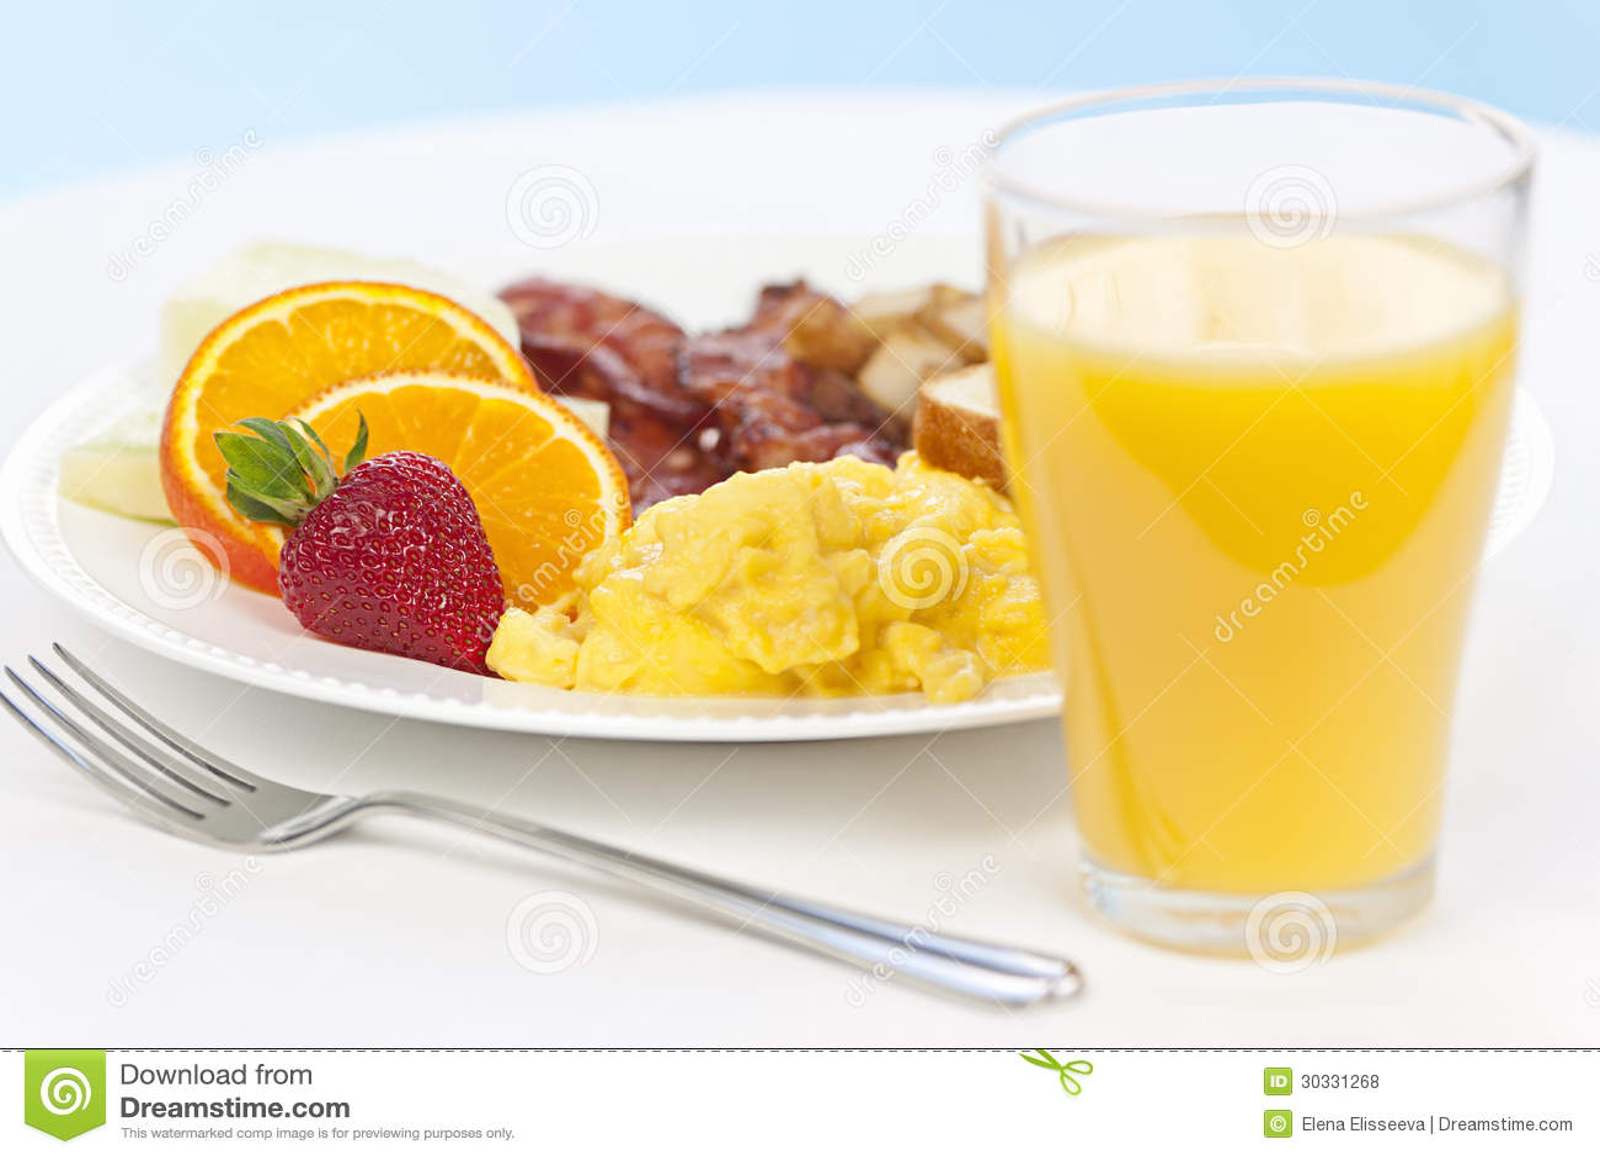 Healthy breakfast of scrambled eggs bacon fruit and orange juice.